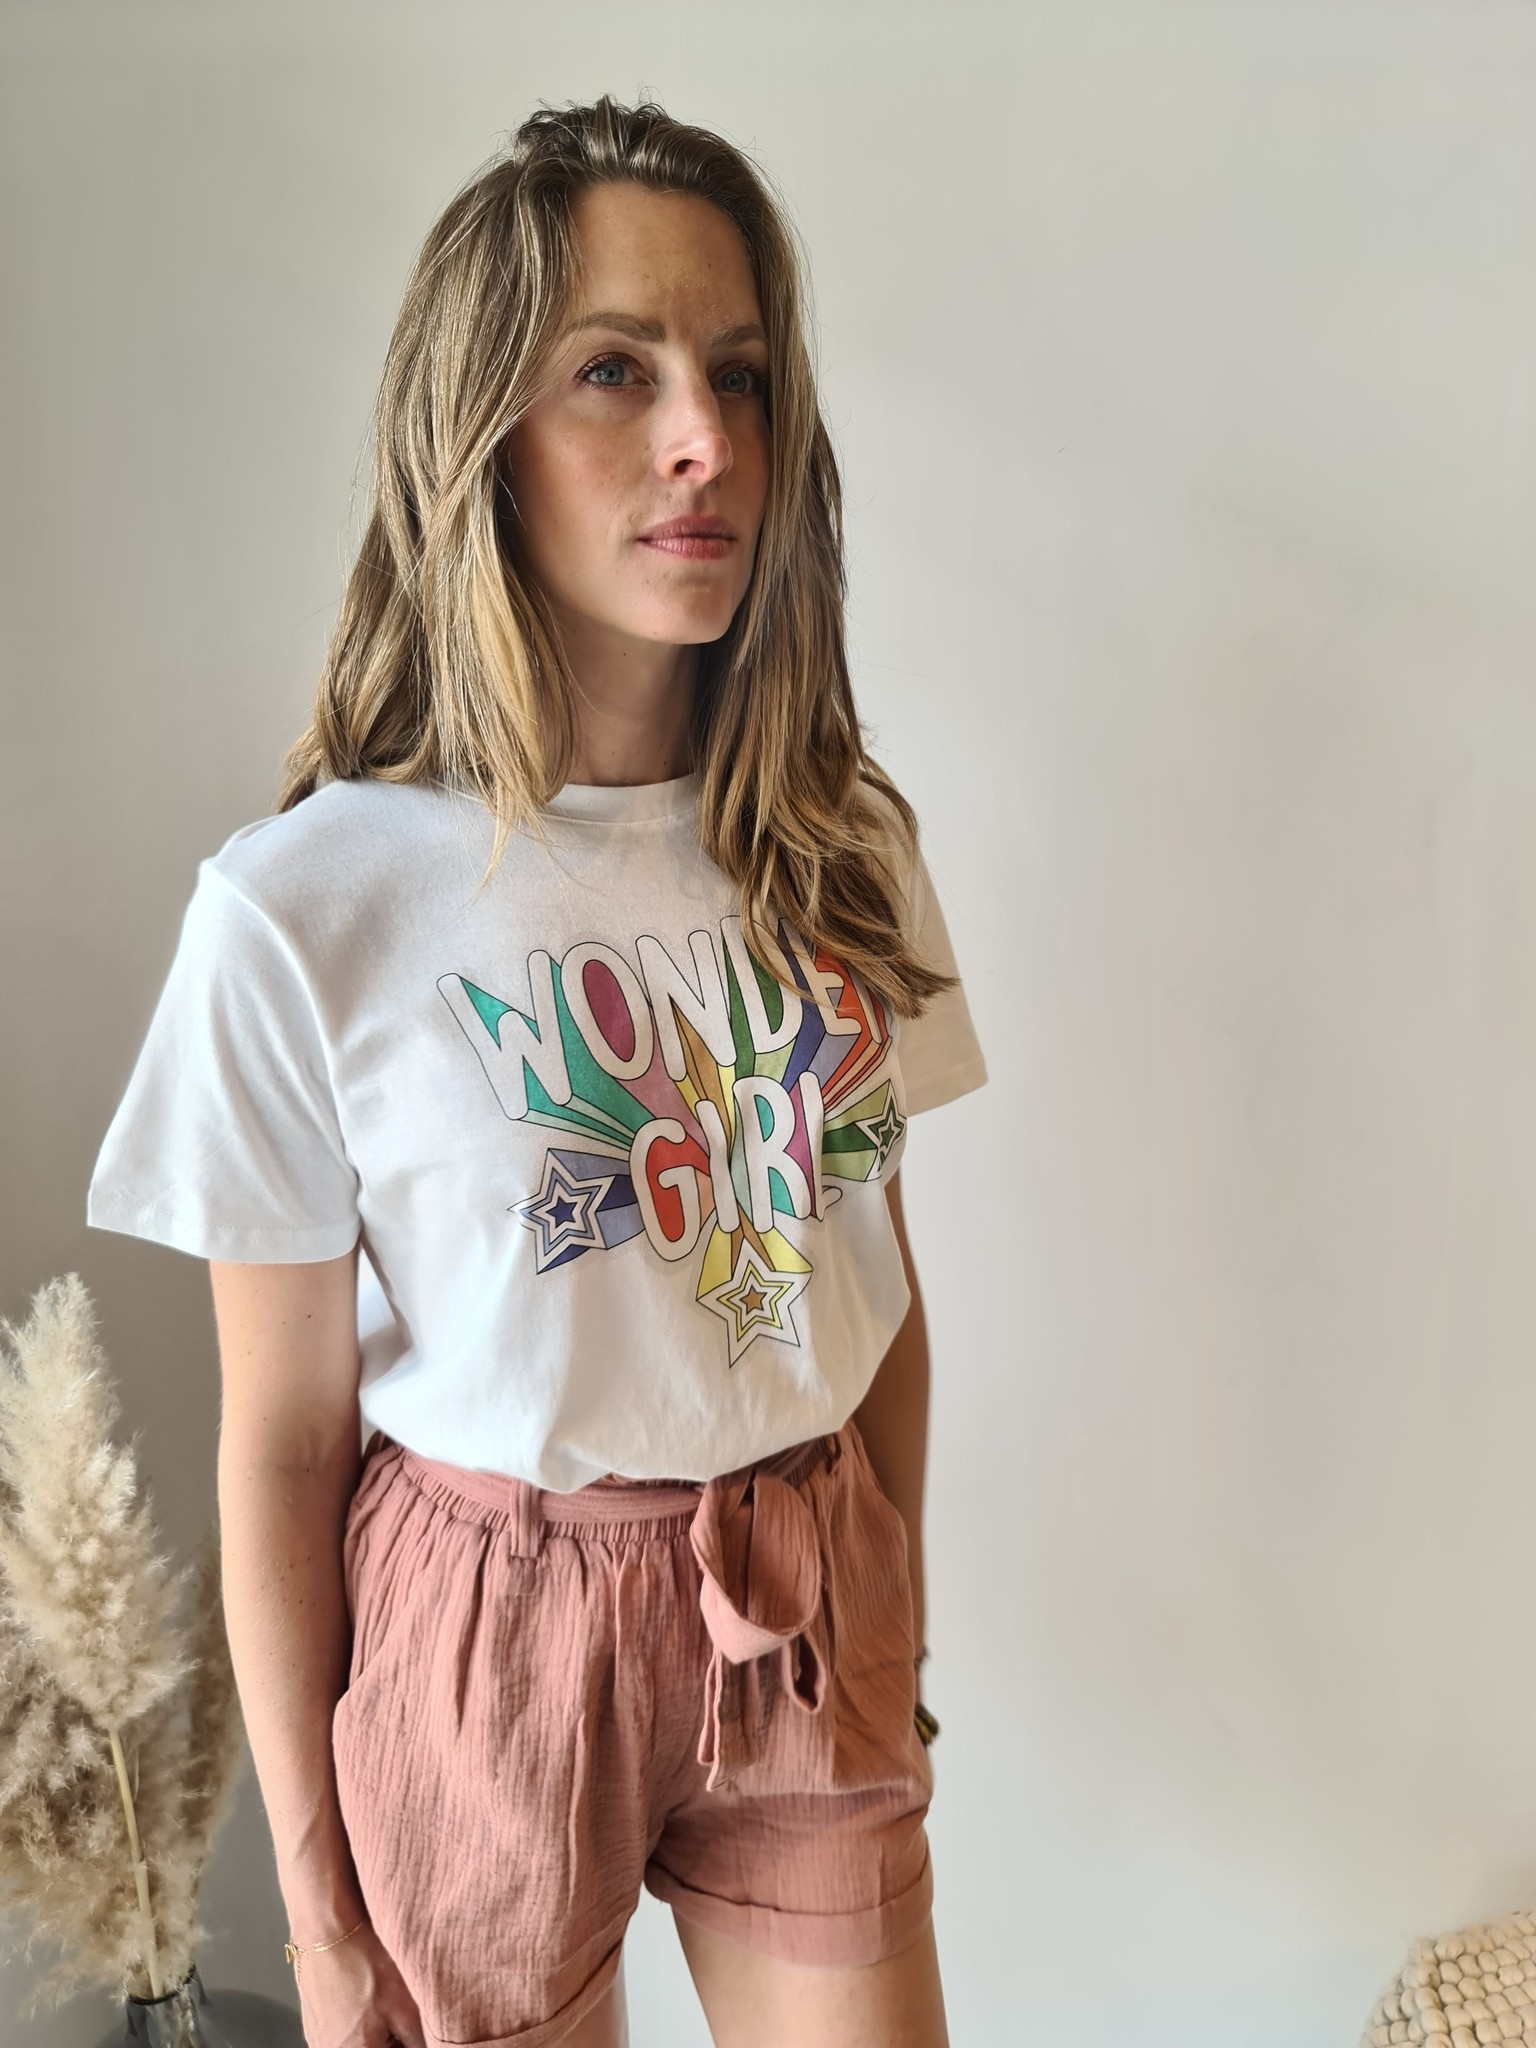 WONDER GIRL t-shirt-1